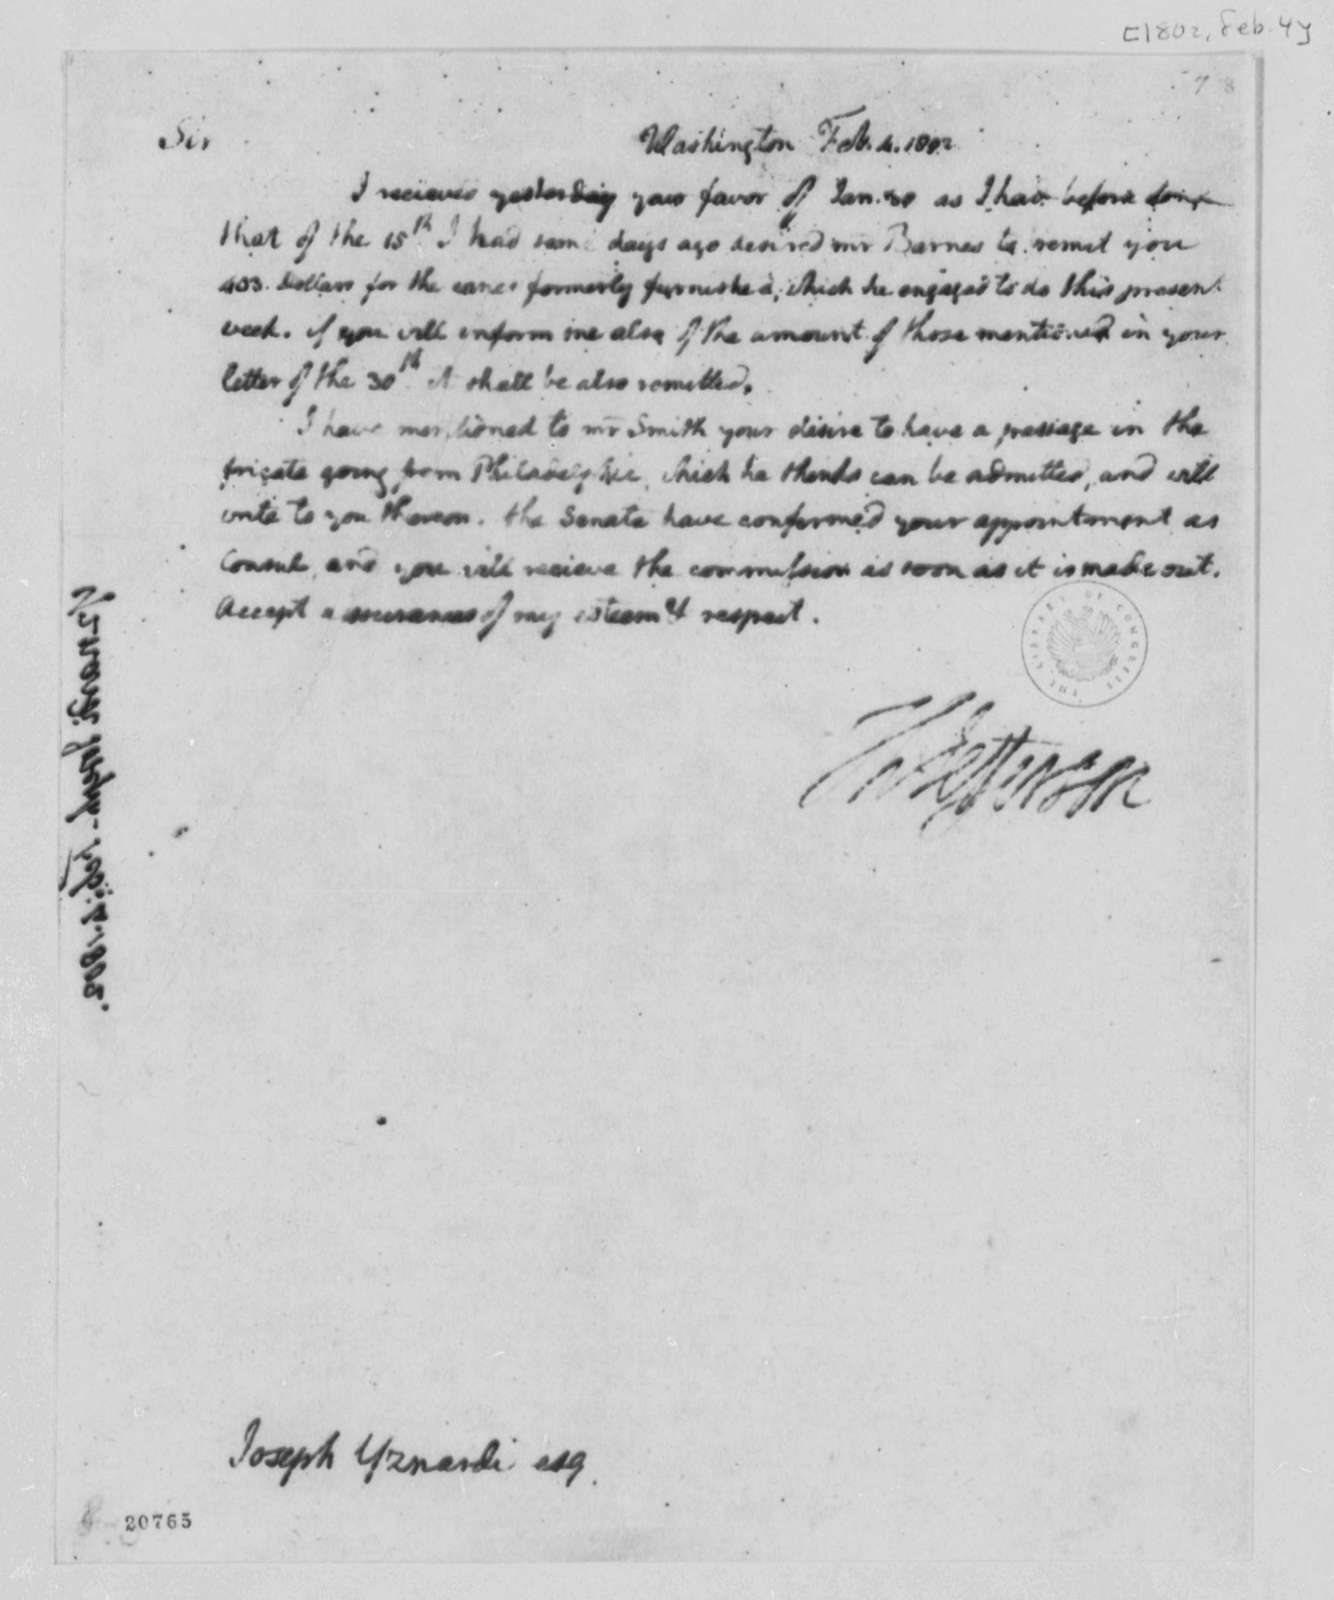 Thomas Jefferson to Josef Yznardi, February 4, 1802